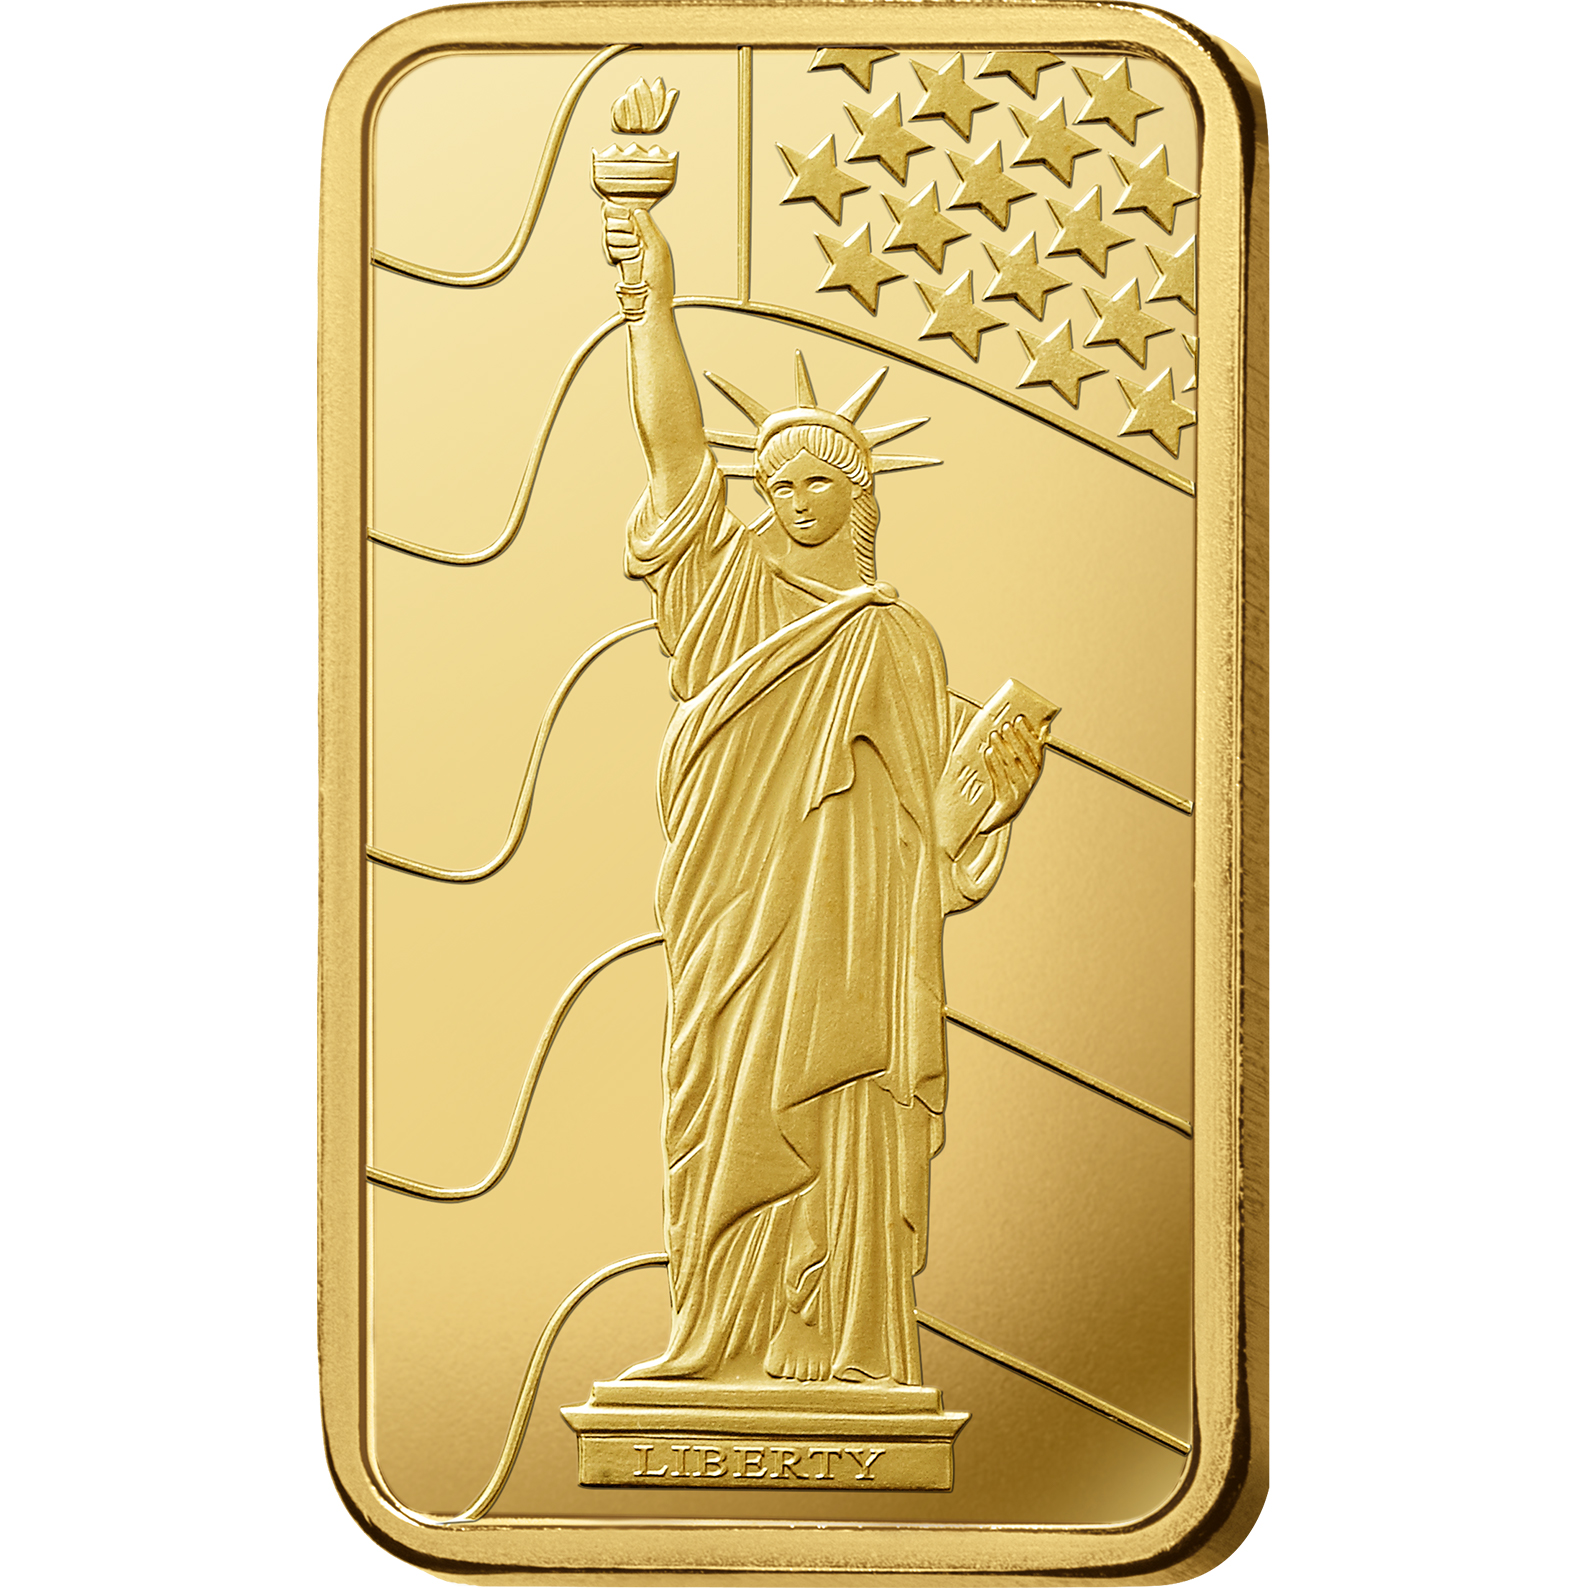 50 grammi lingottino d'oro - PAMP Suisse Liberty